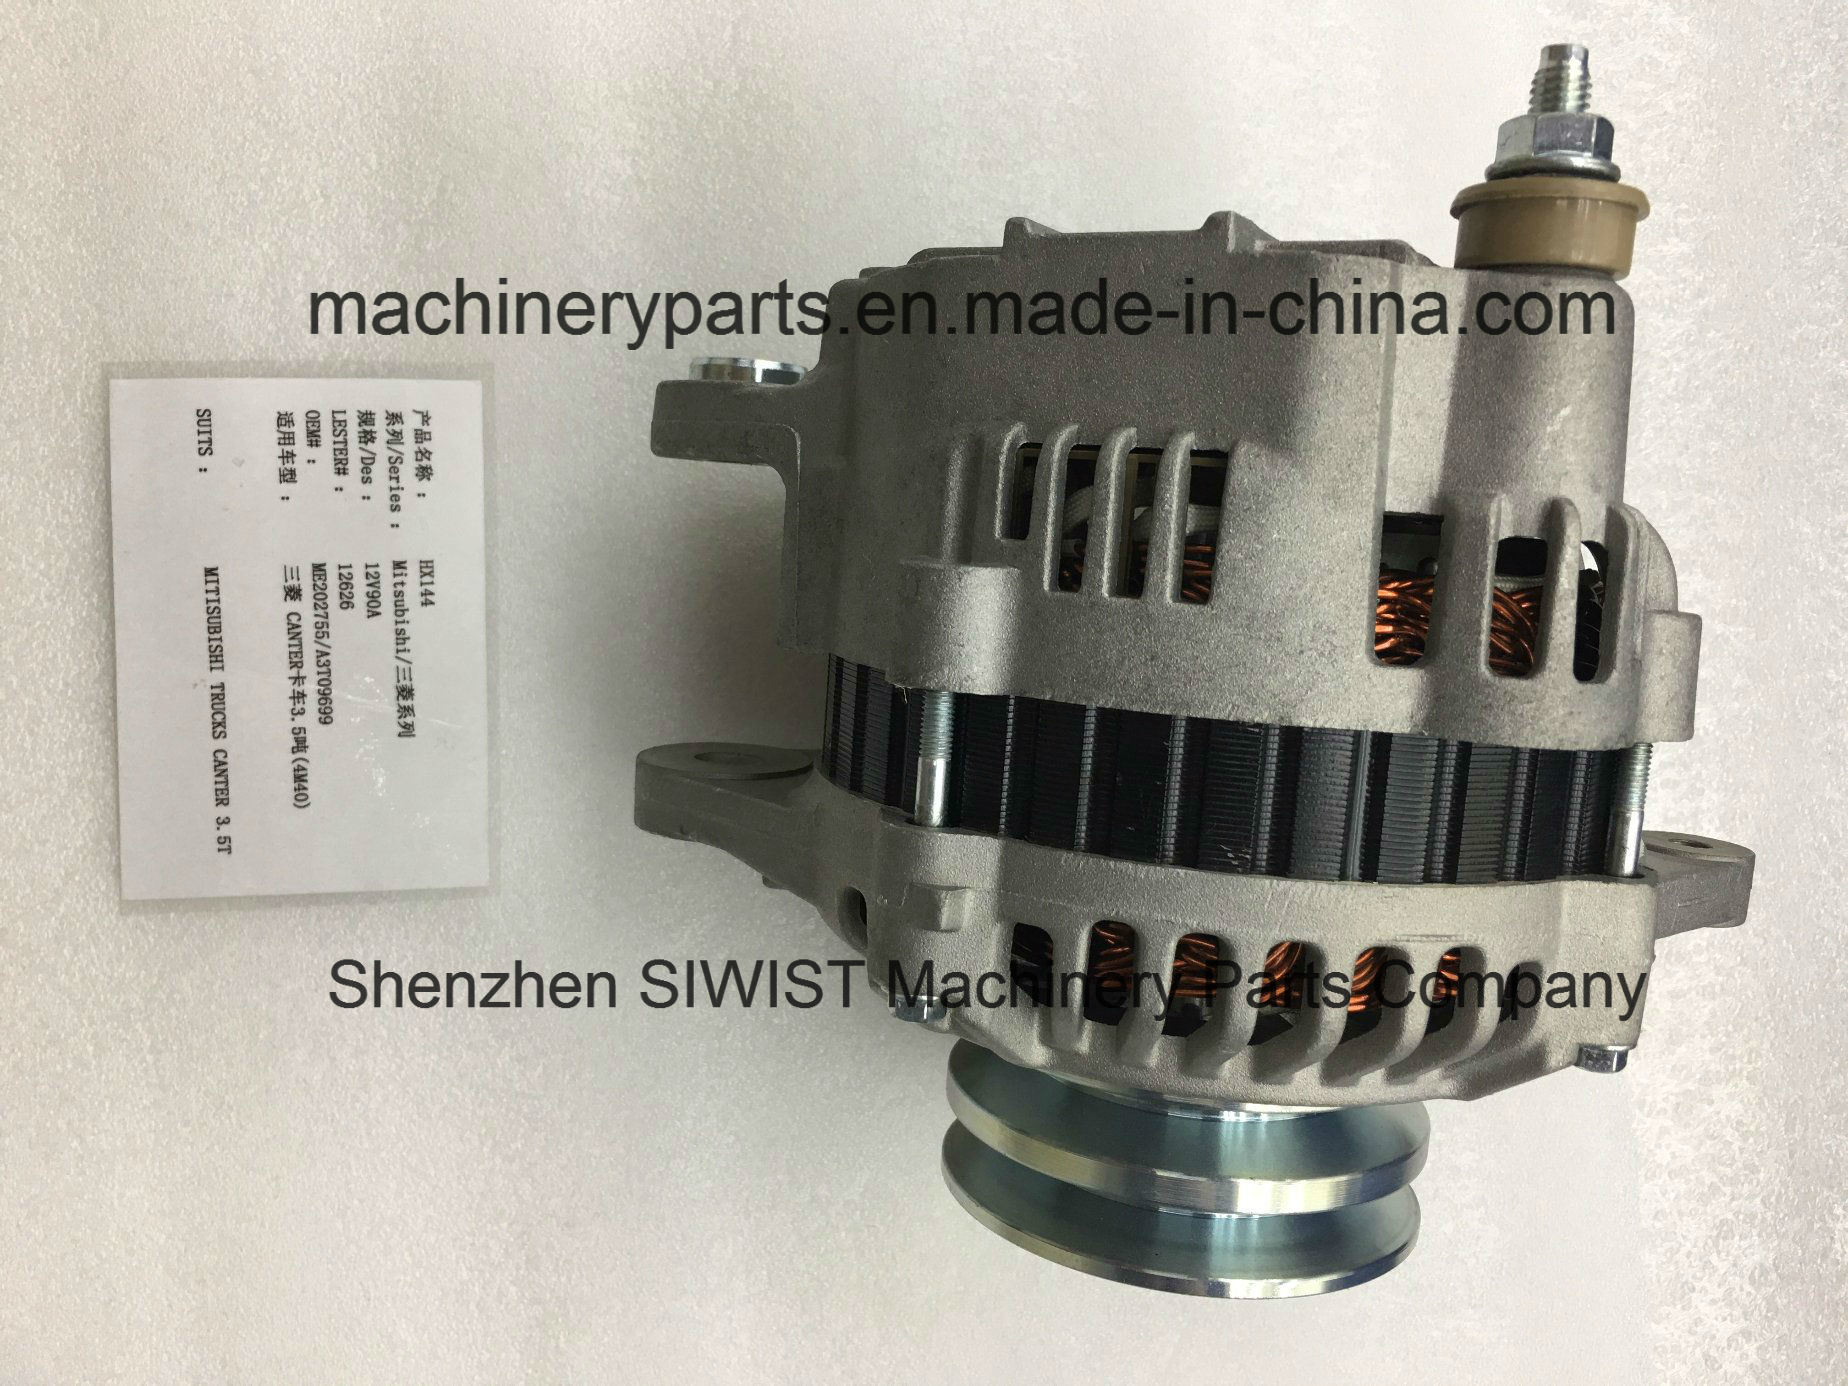 China Alternator Lester12626 Me202755 A3t09699 A3t09198 A3t09199